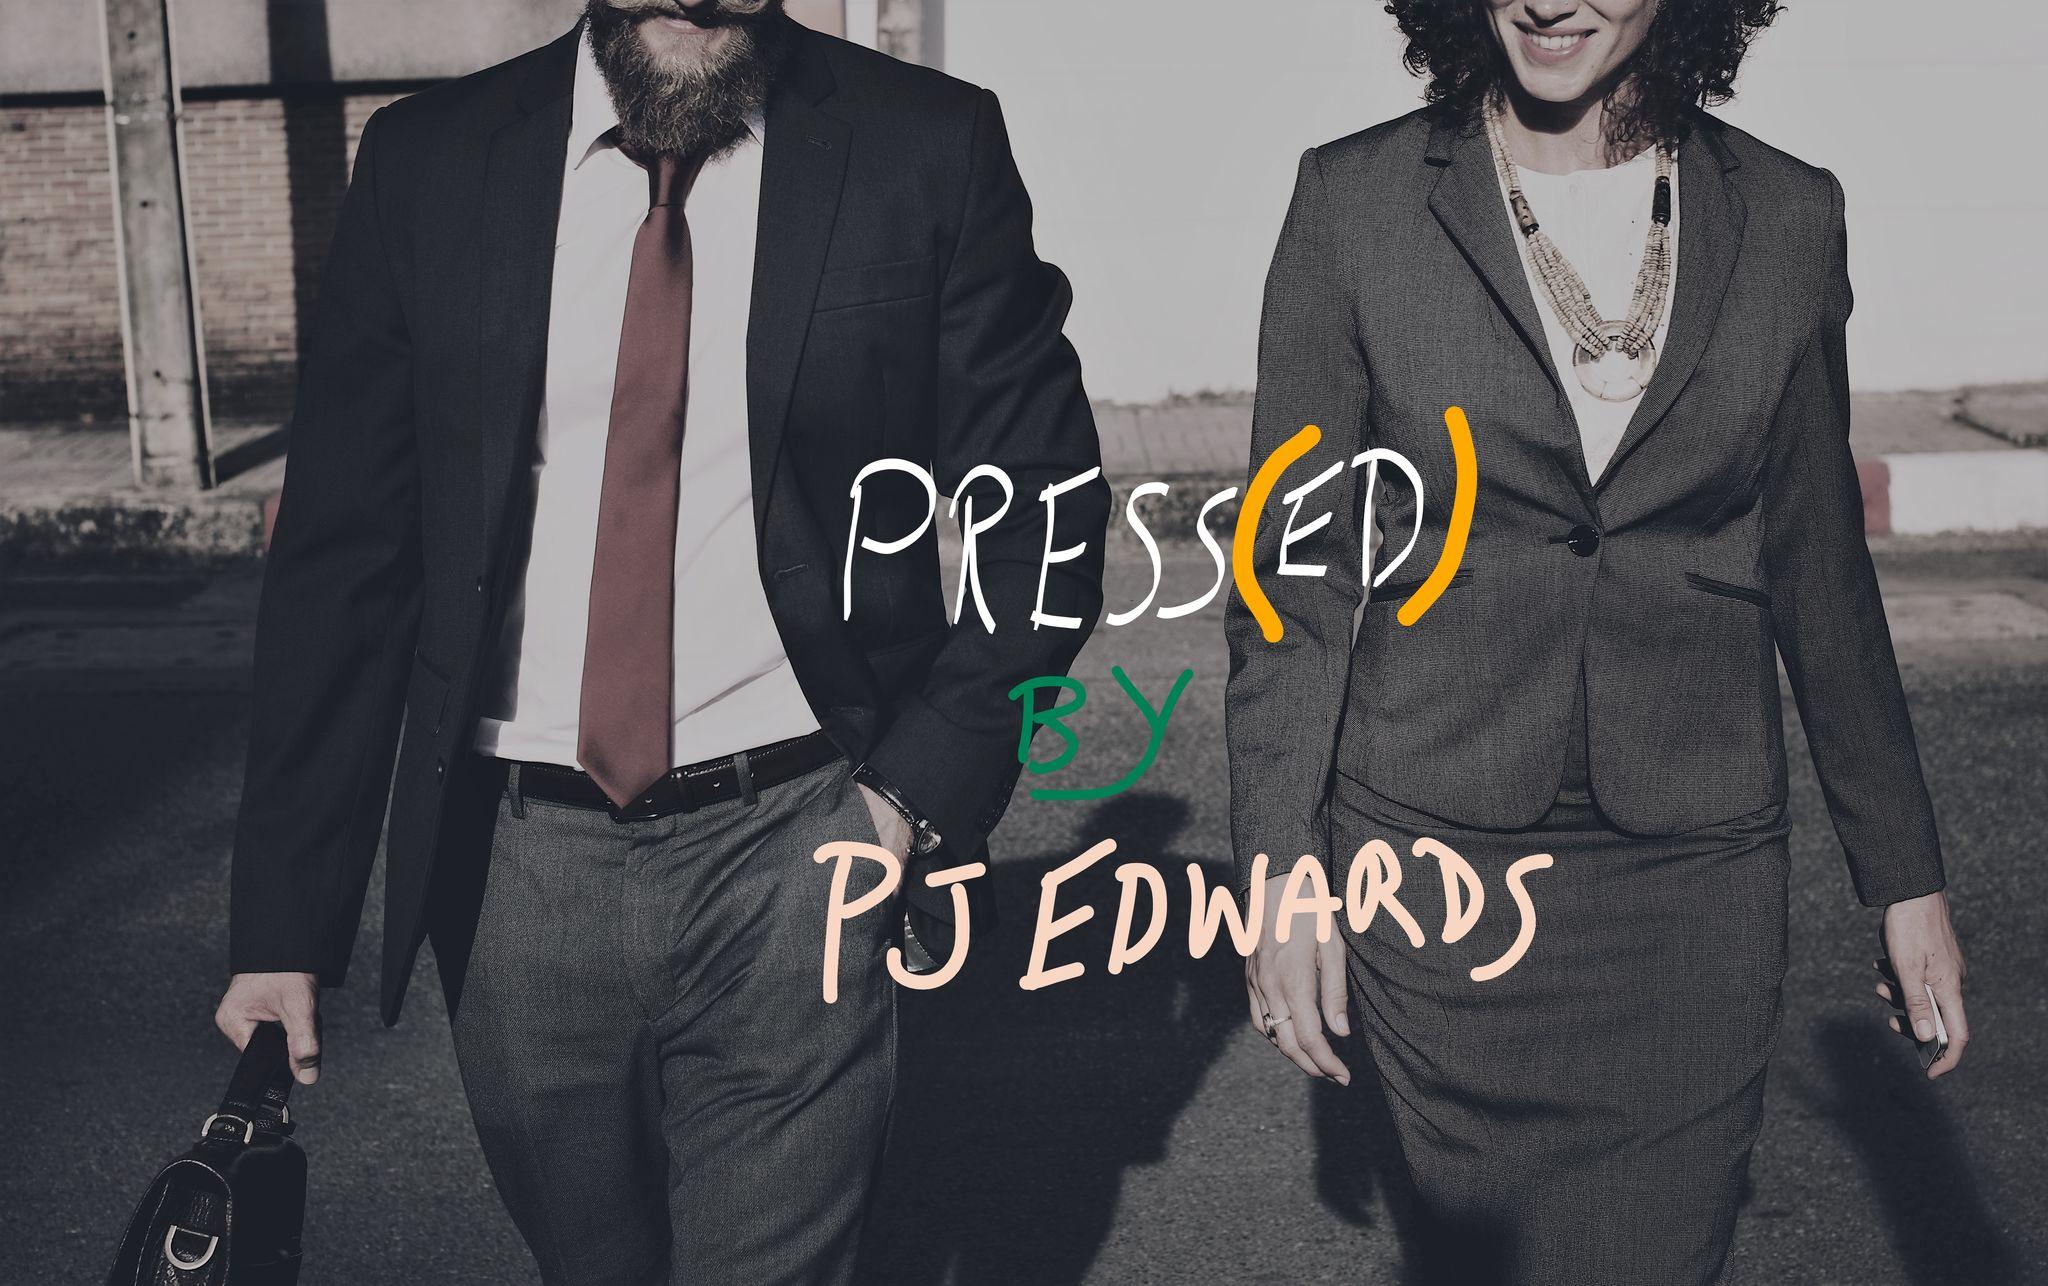 PRESS(ED)